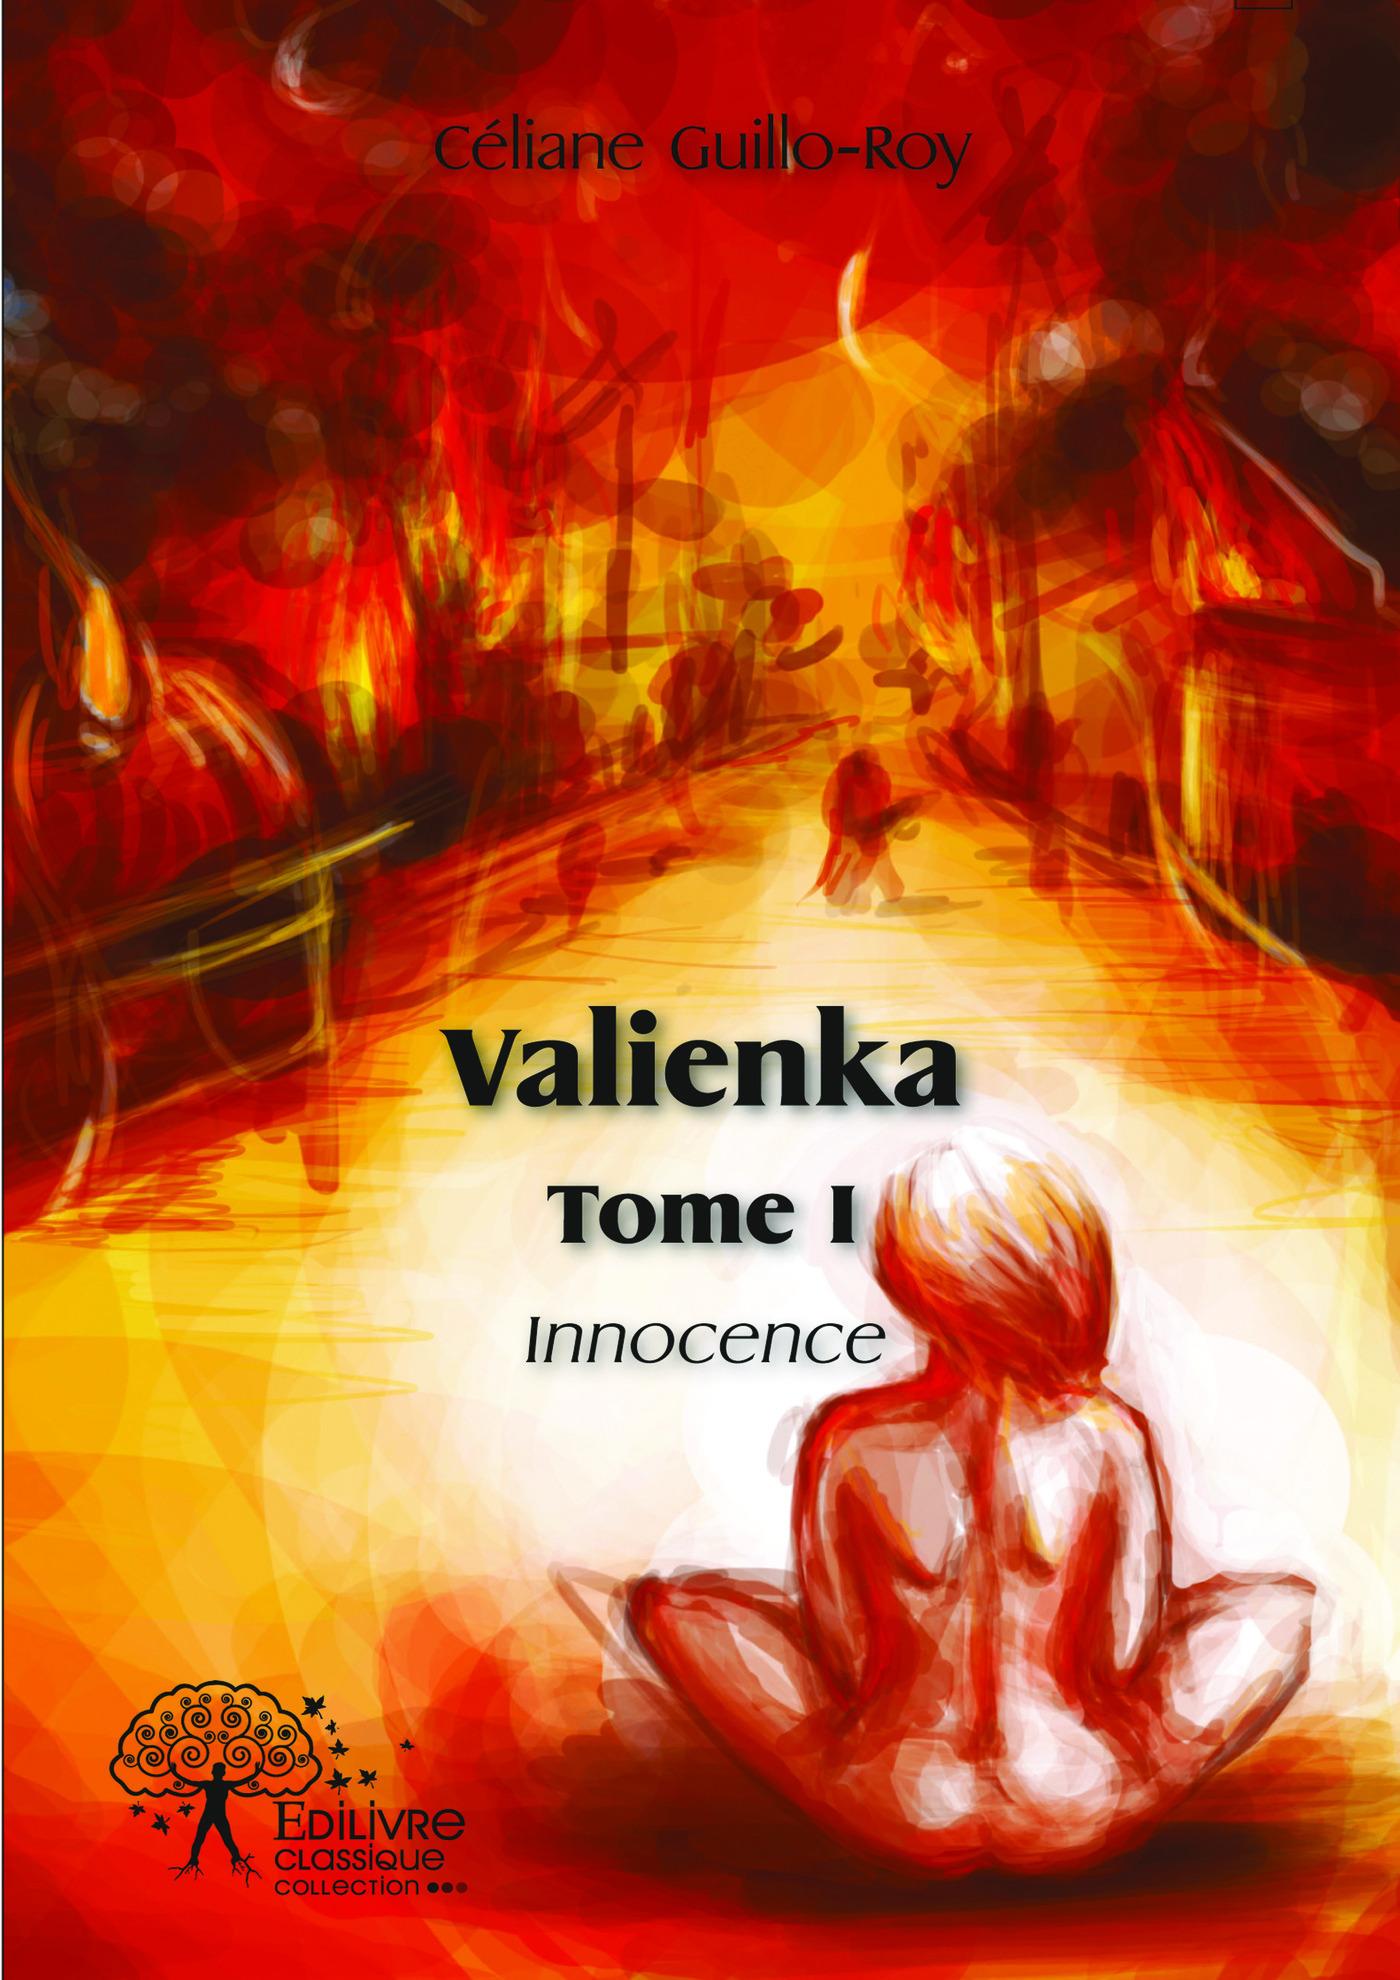 Valienka Tome I  - Céliane Guillo-Roy